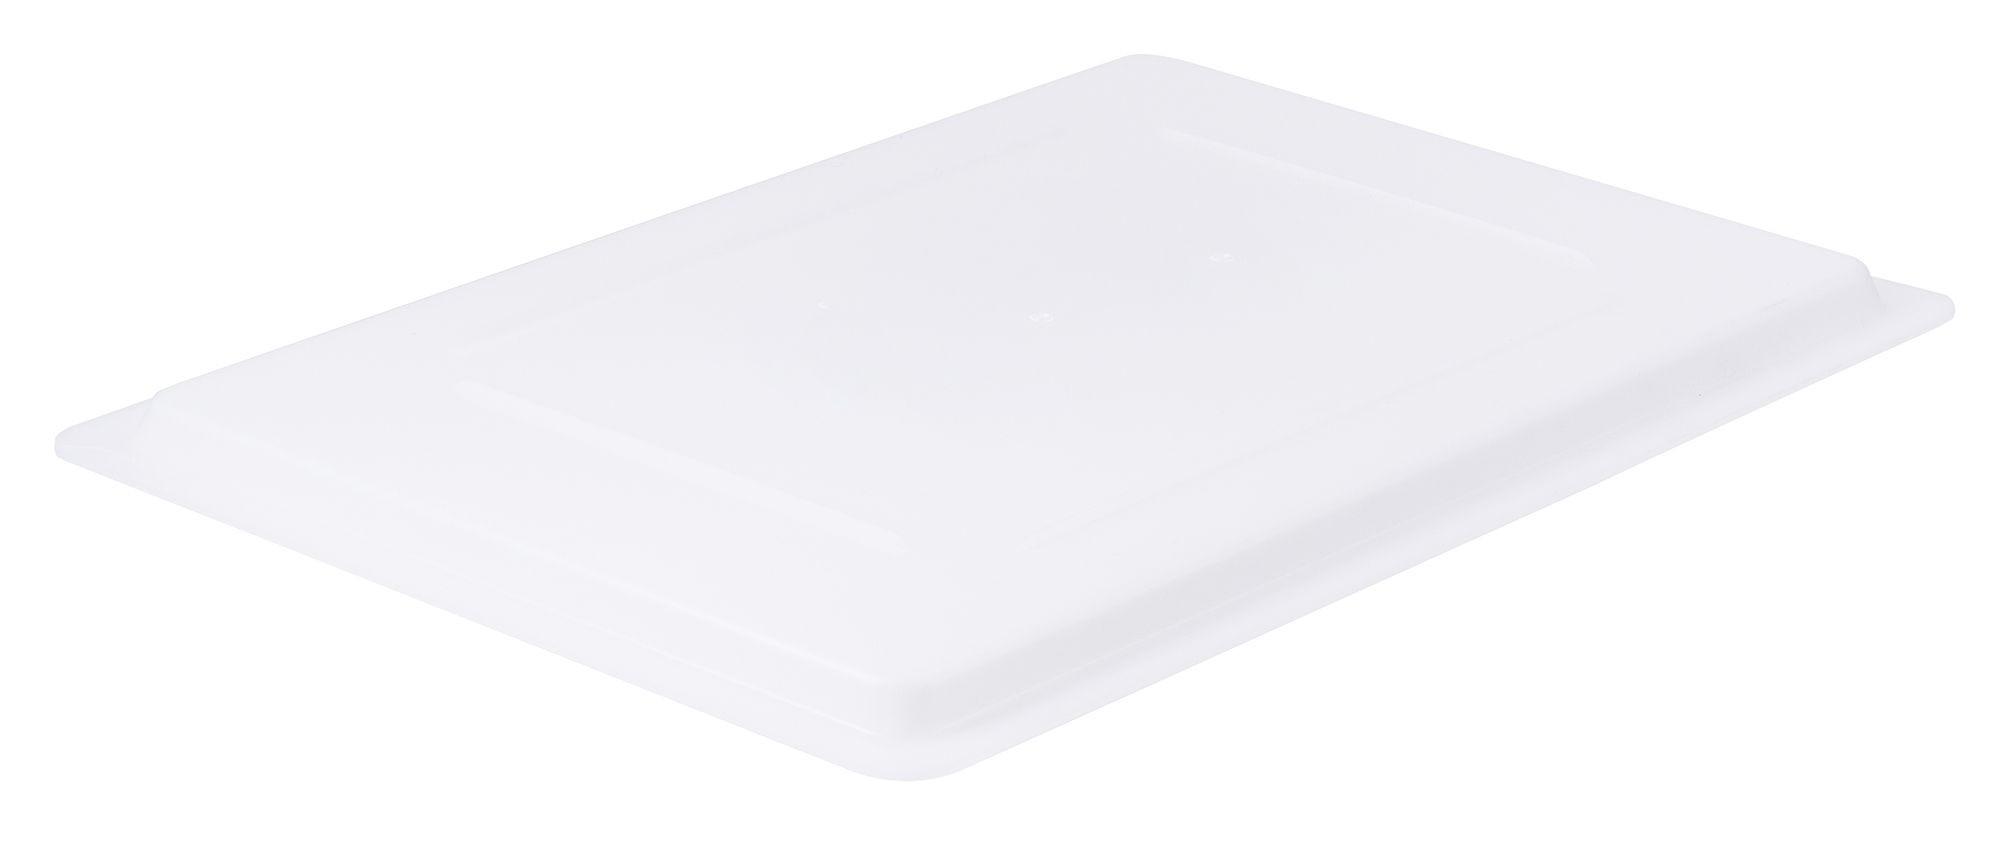 "Winco PFHW-C White Food Storage Box Cover 18"" x 12"""